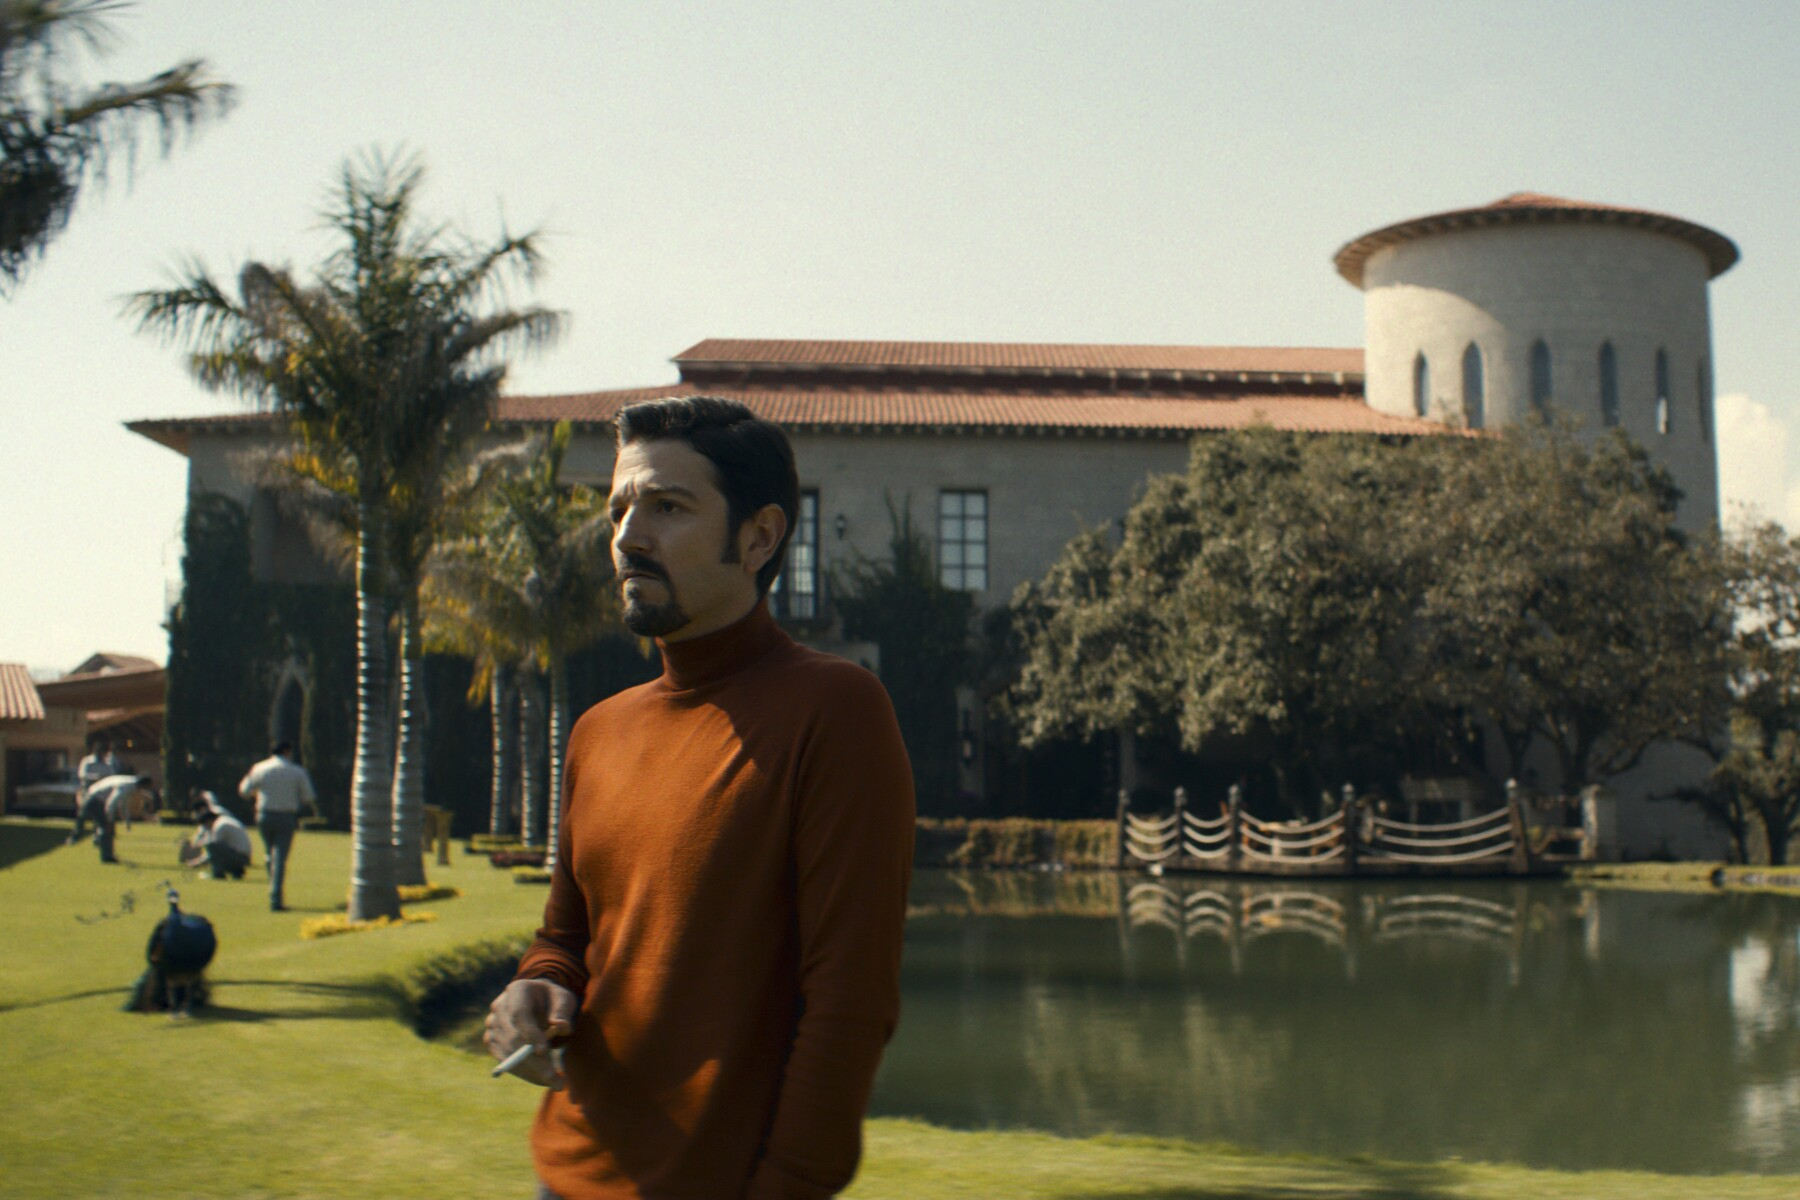 La segunda temporada de Narcos México estrena el 14 de febrero en Netflix.